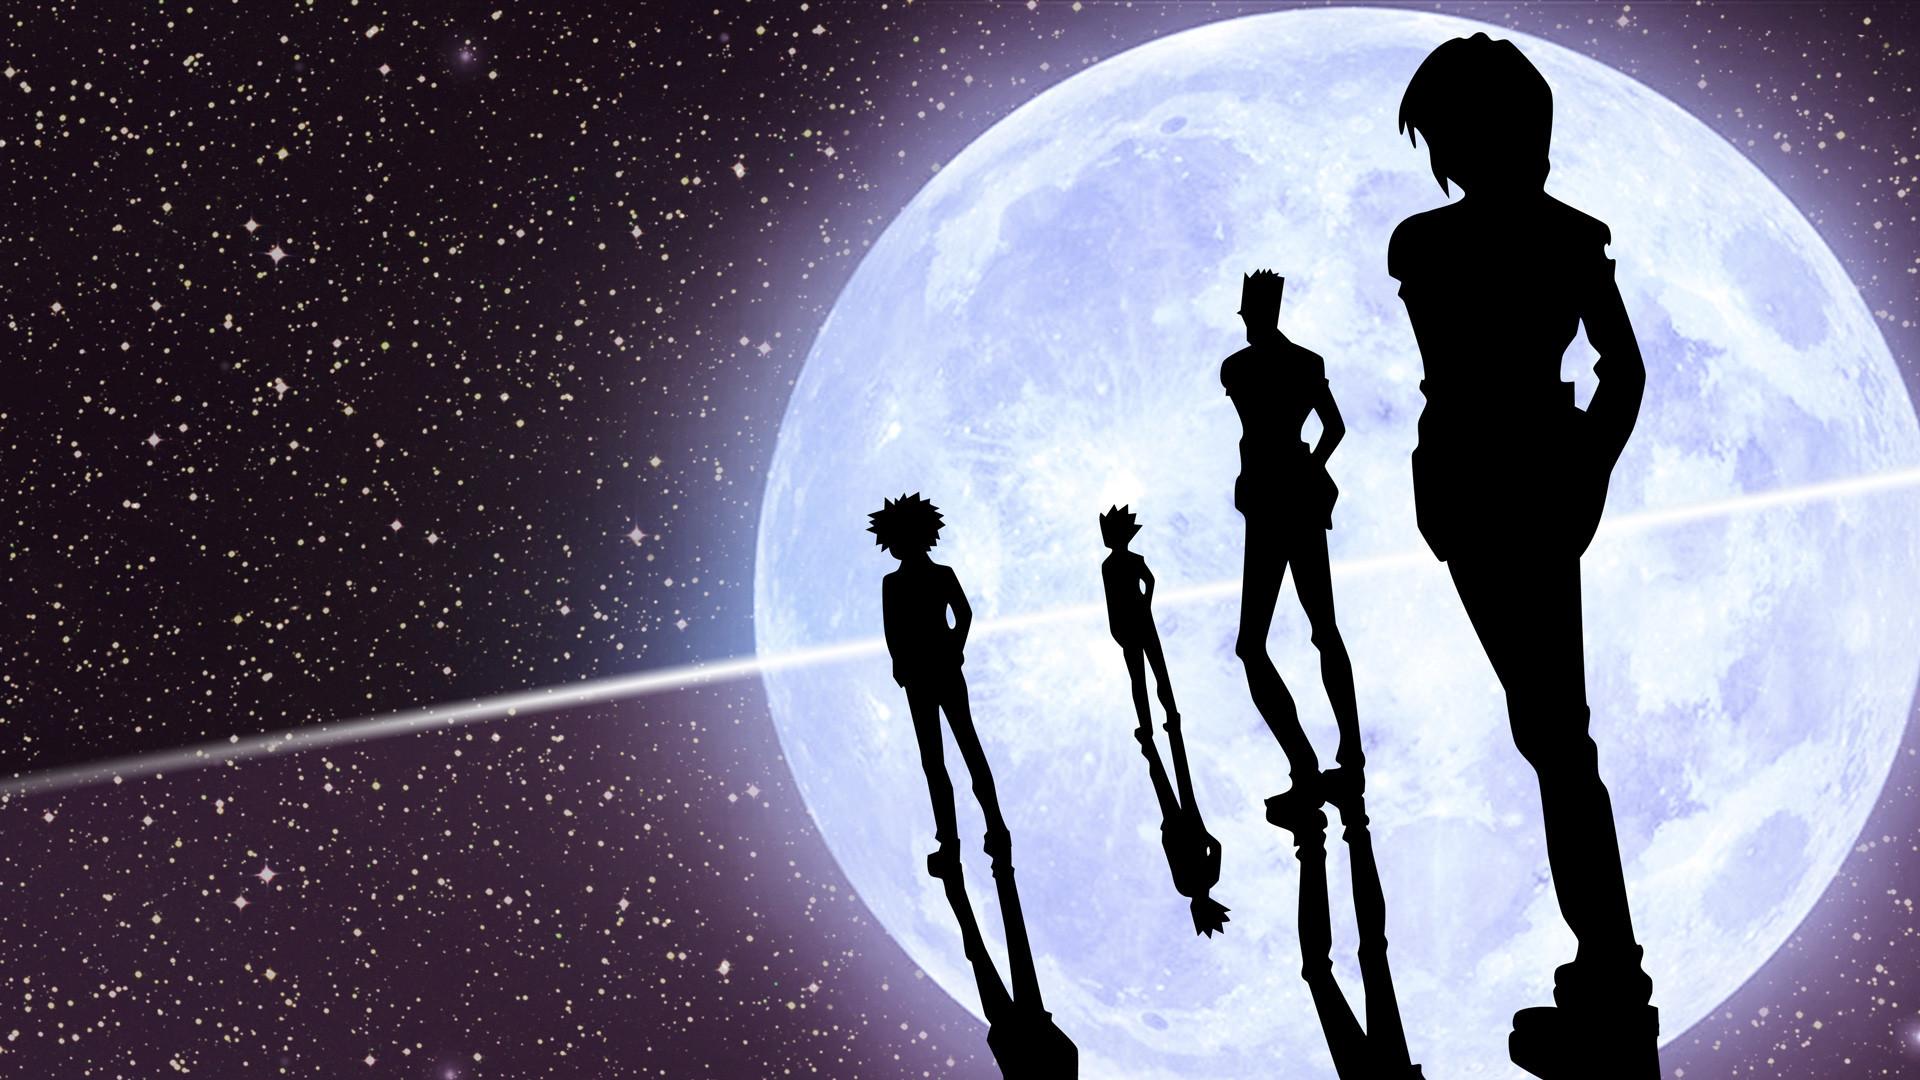 Gon, Killua, Leorio and Kurapika.